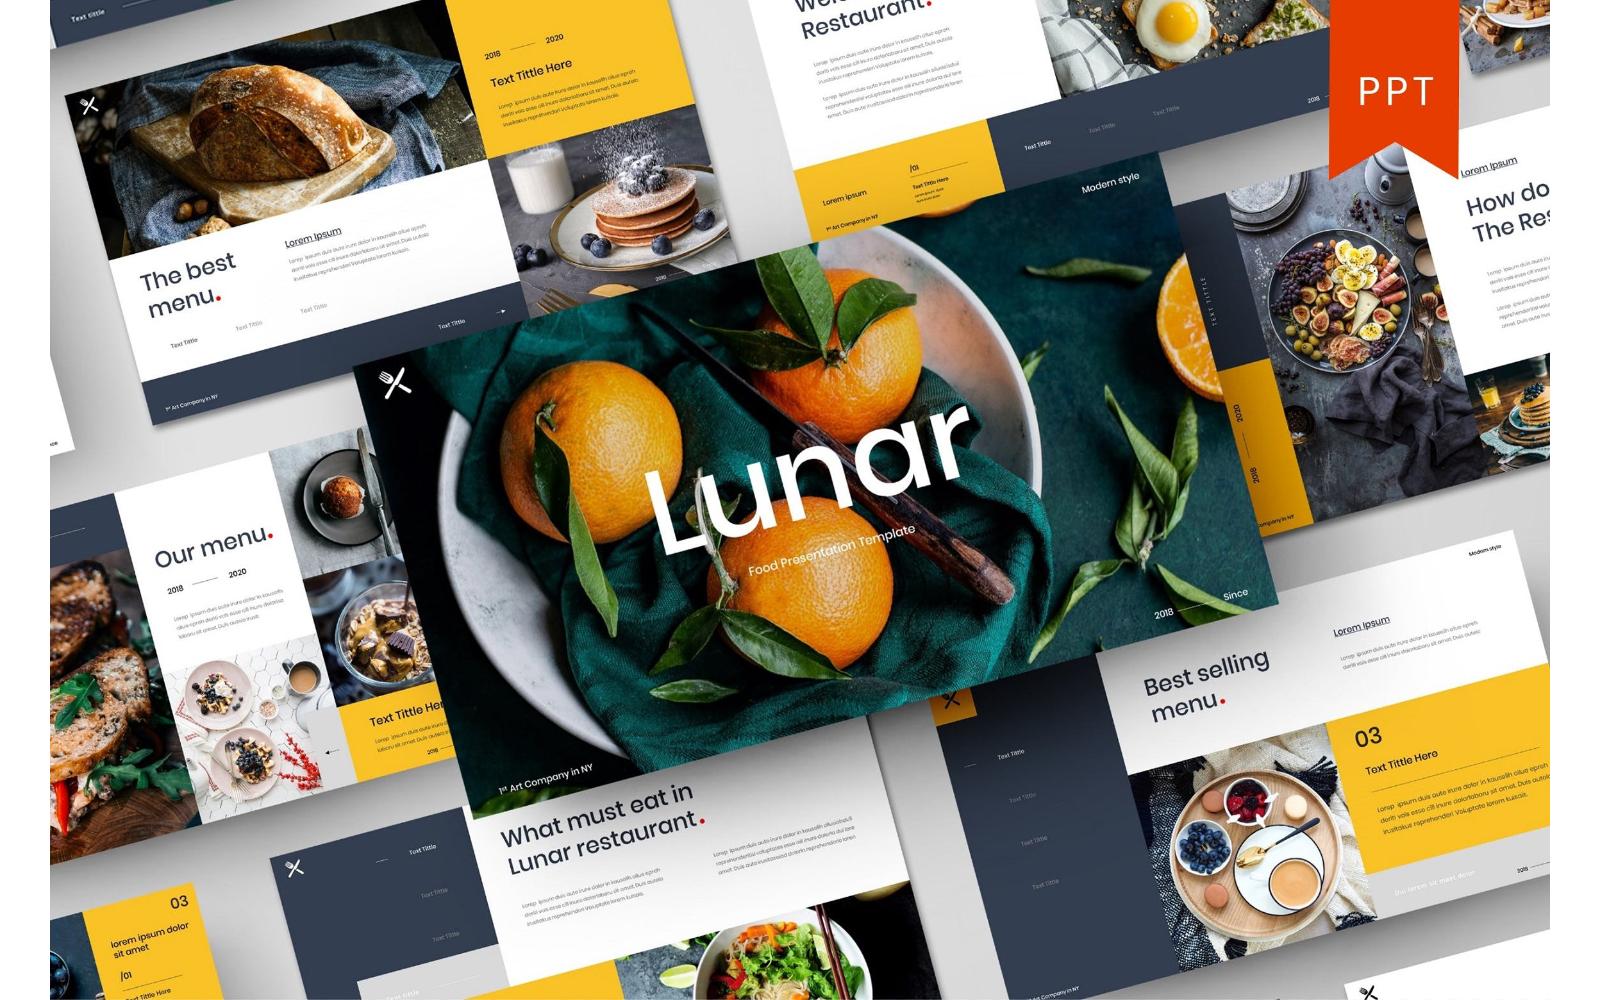 Lunar – Food Business PowerPoint Template